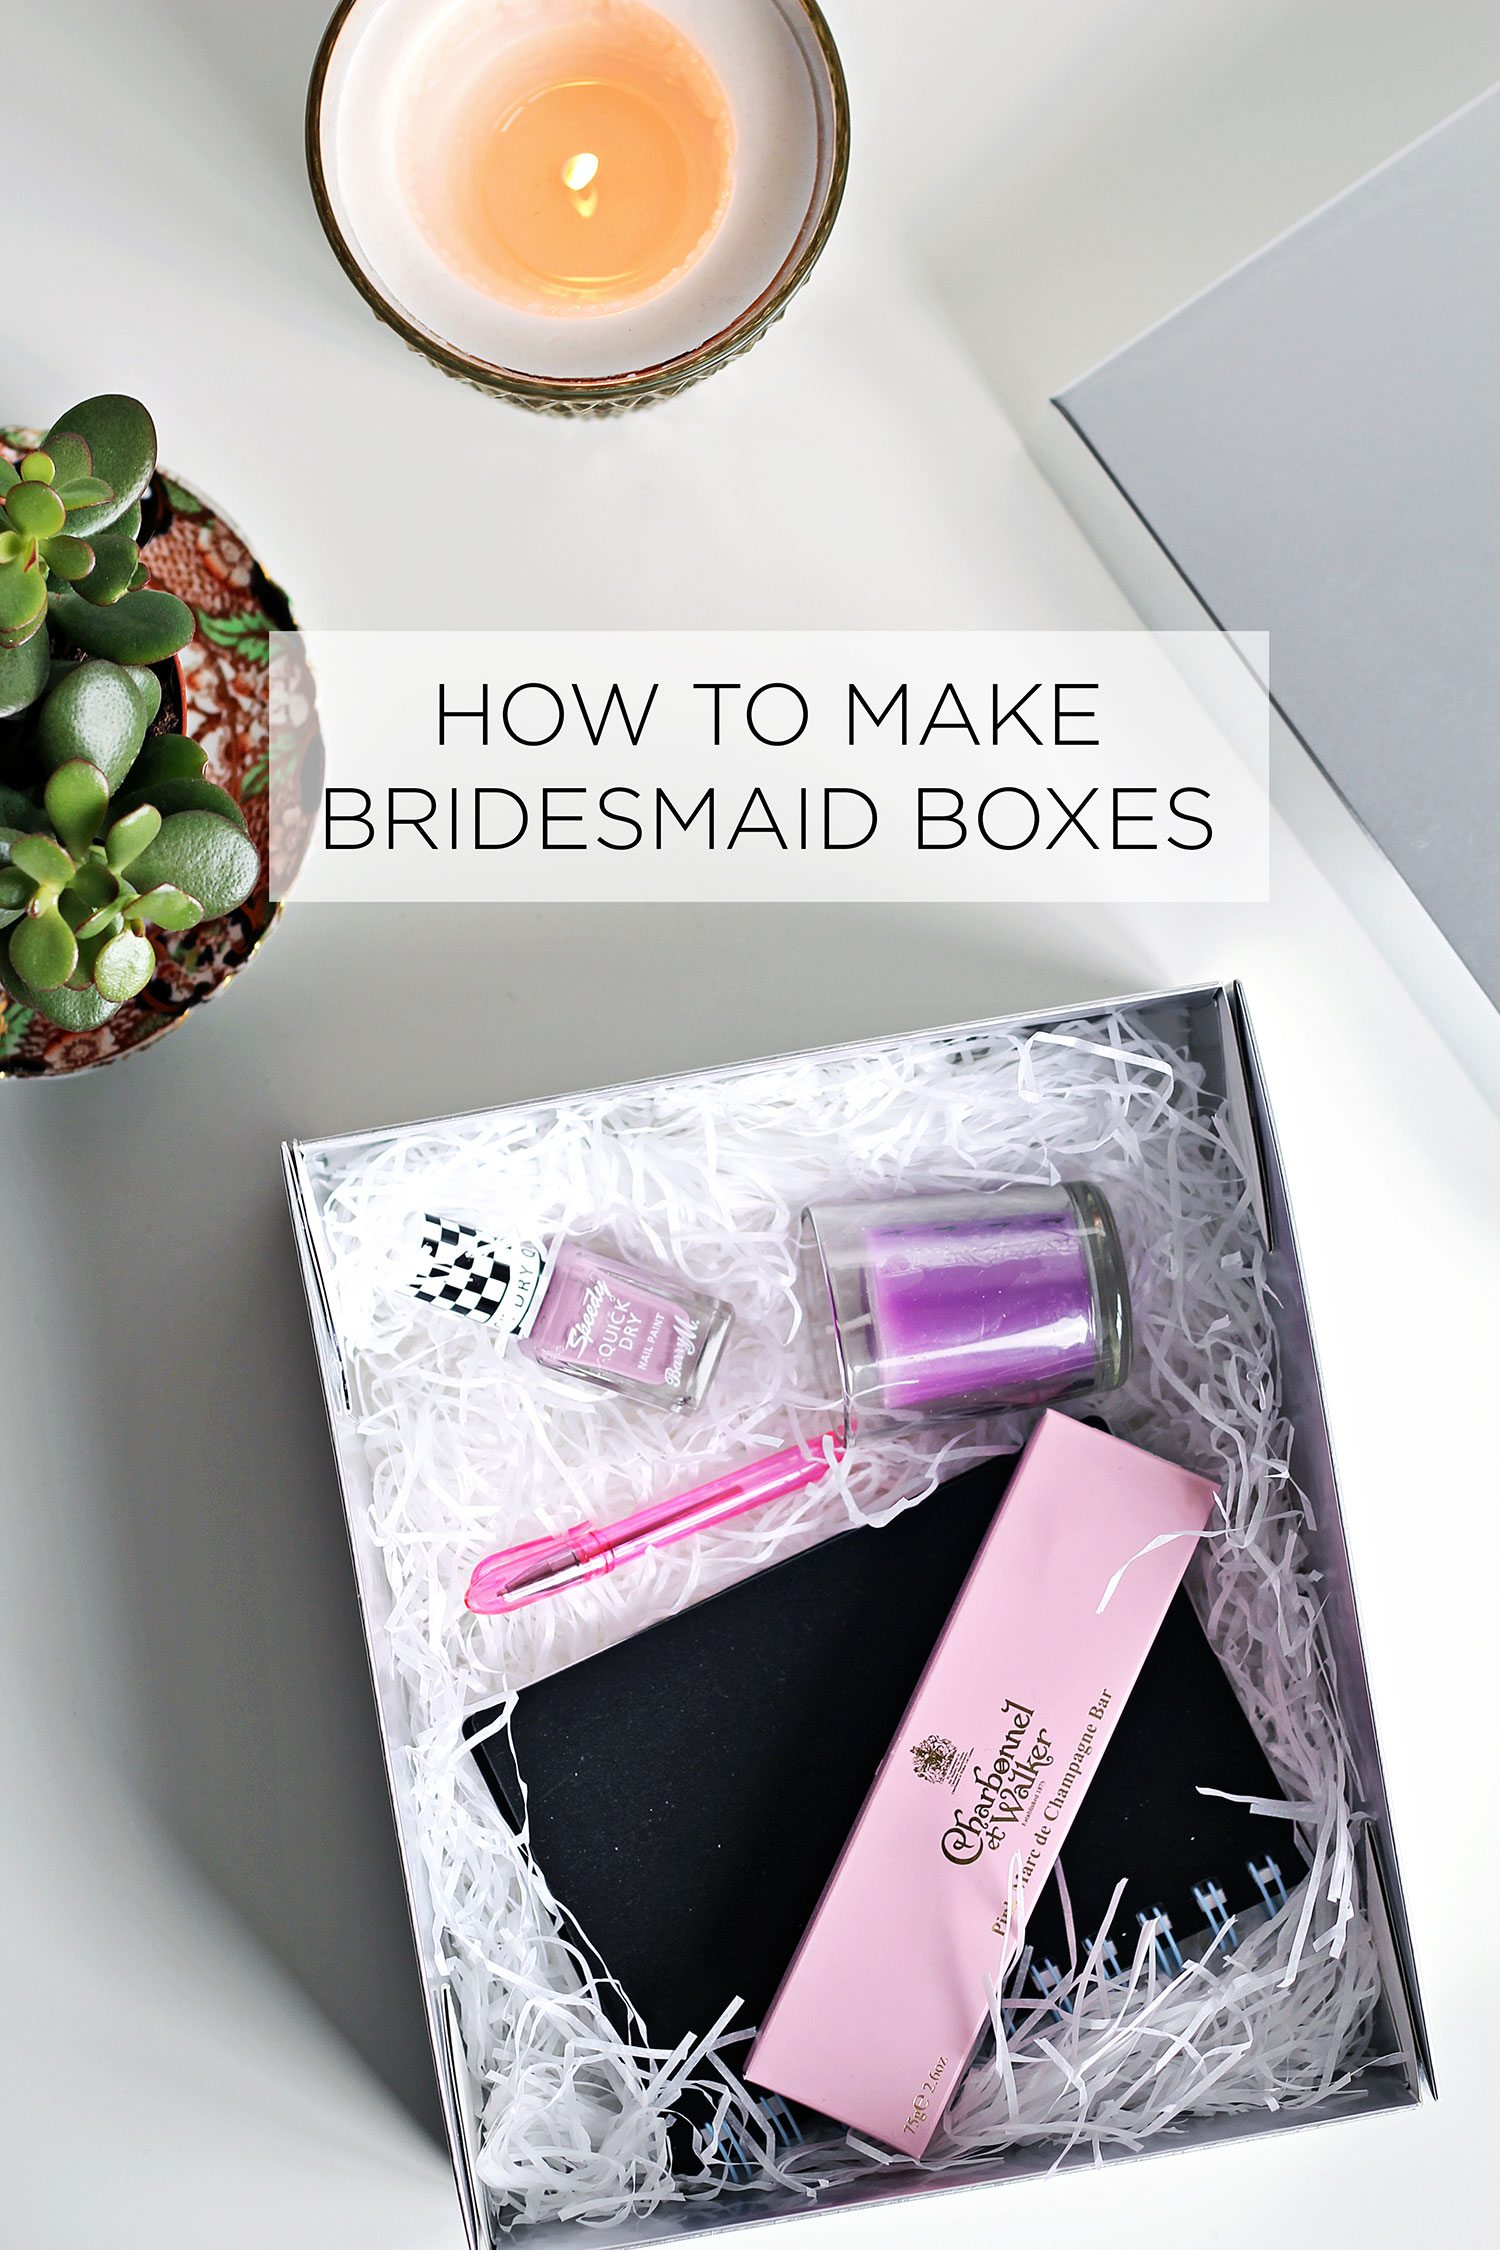 How-to-make-bridesmaid-boxes